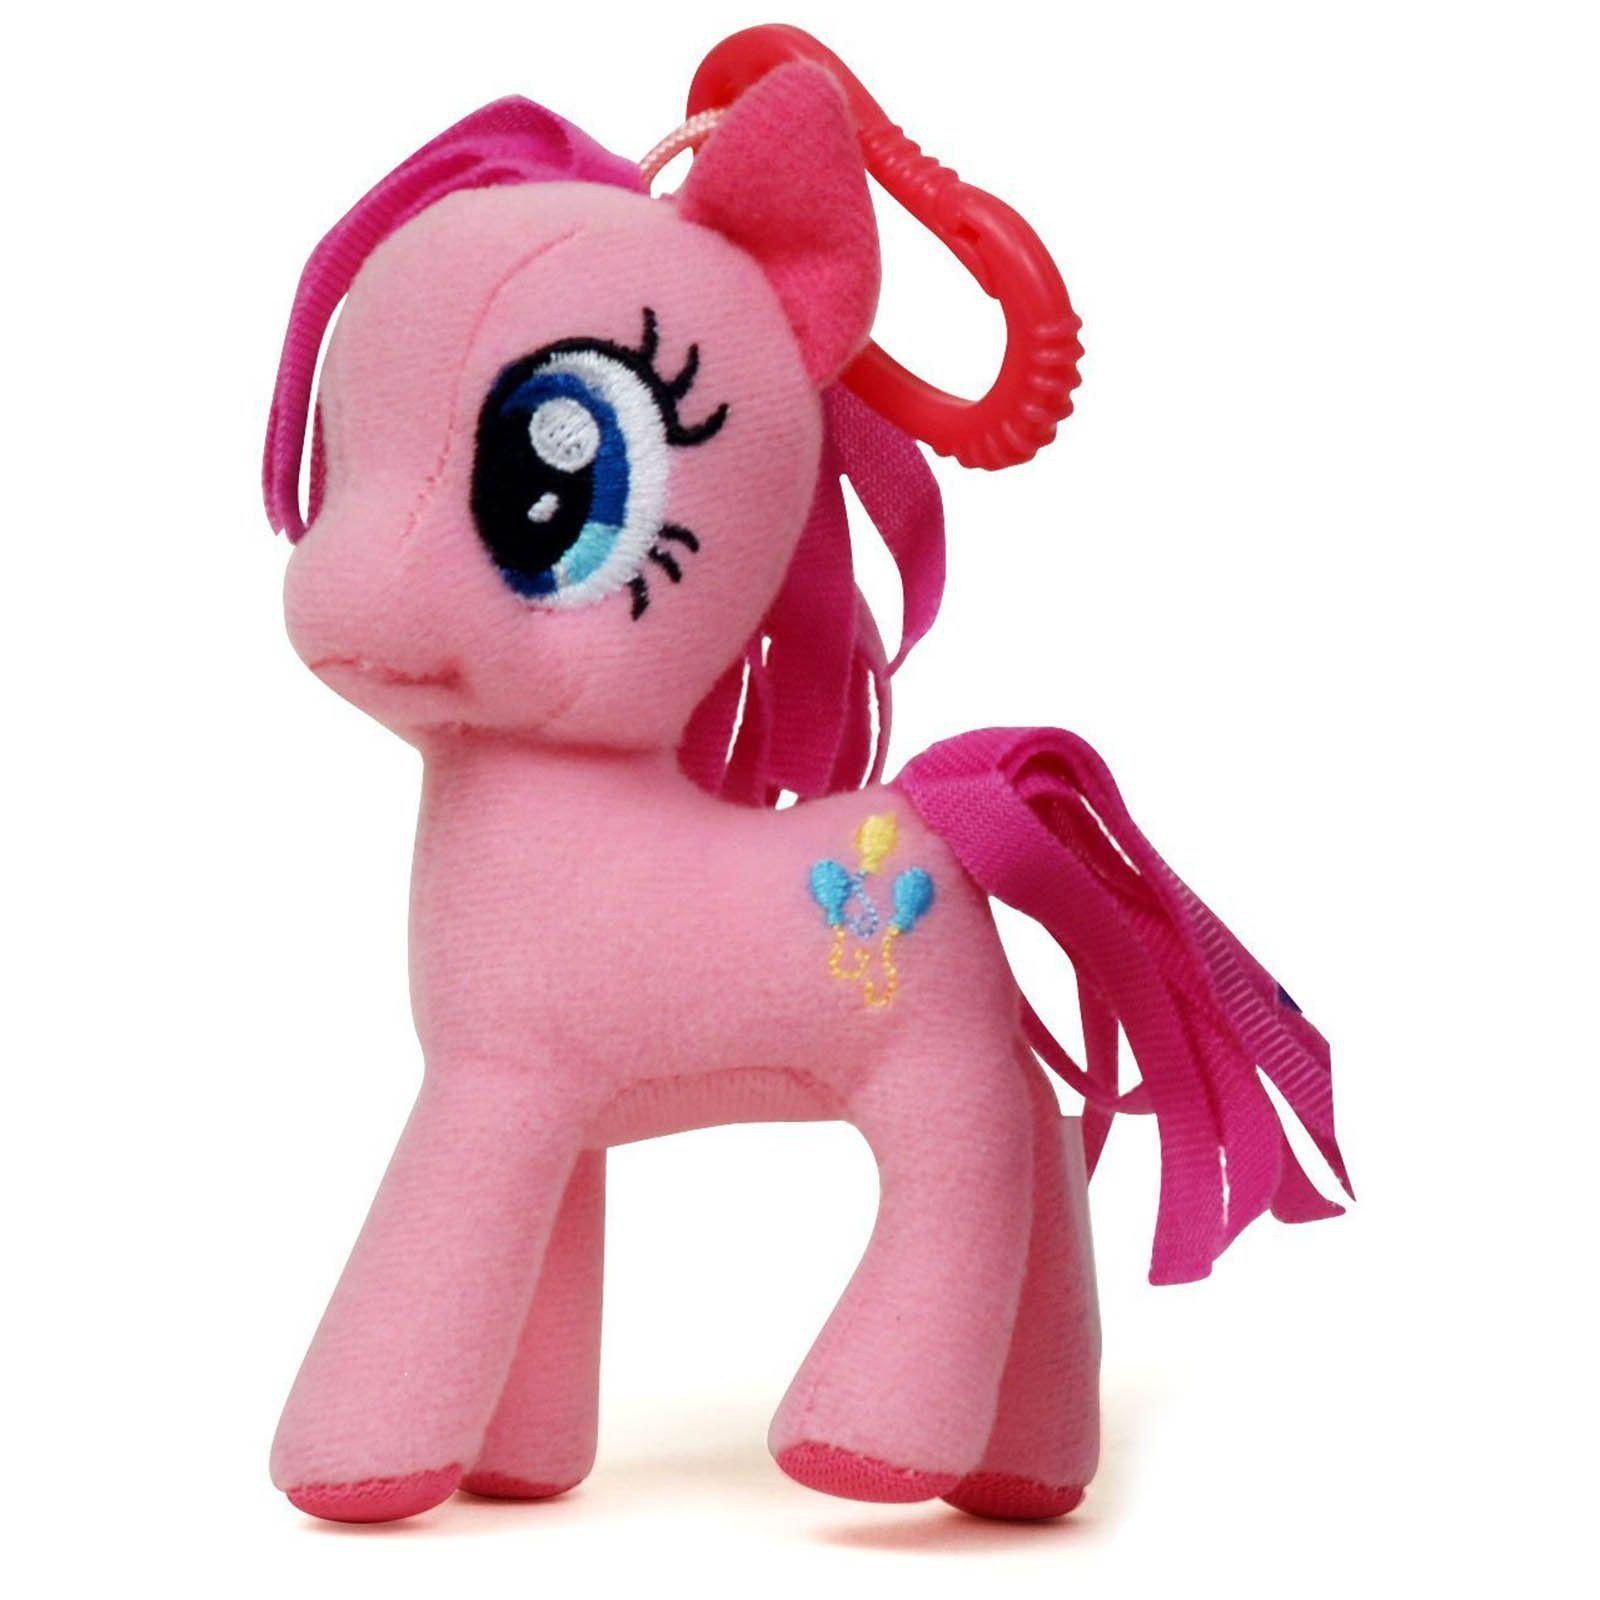 My Little Pony Friendship Is Magic 3 Inch Pinkie Pie Plush Clip Figure - Radar Toys